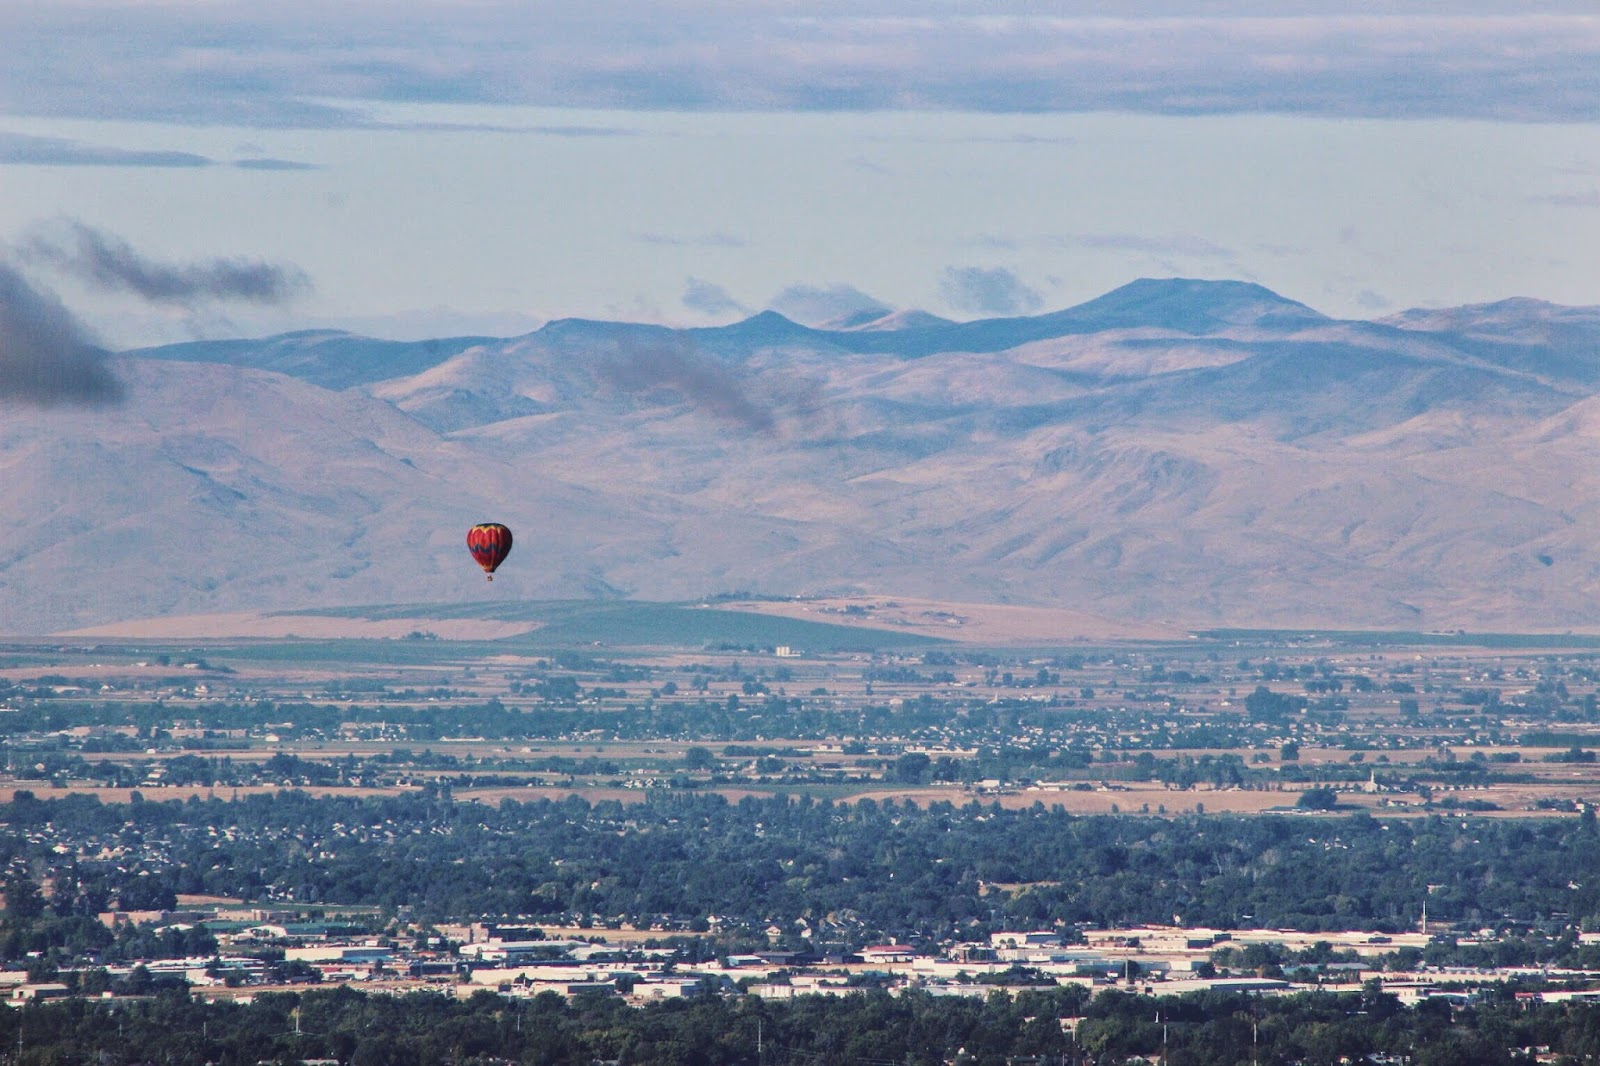 balloon%2Bover%2Bthe%2Btreasure%2Bvalley.jpg